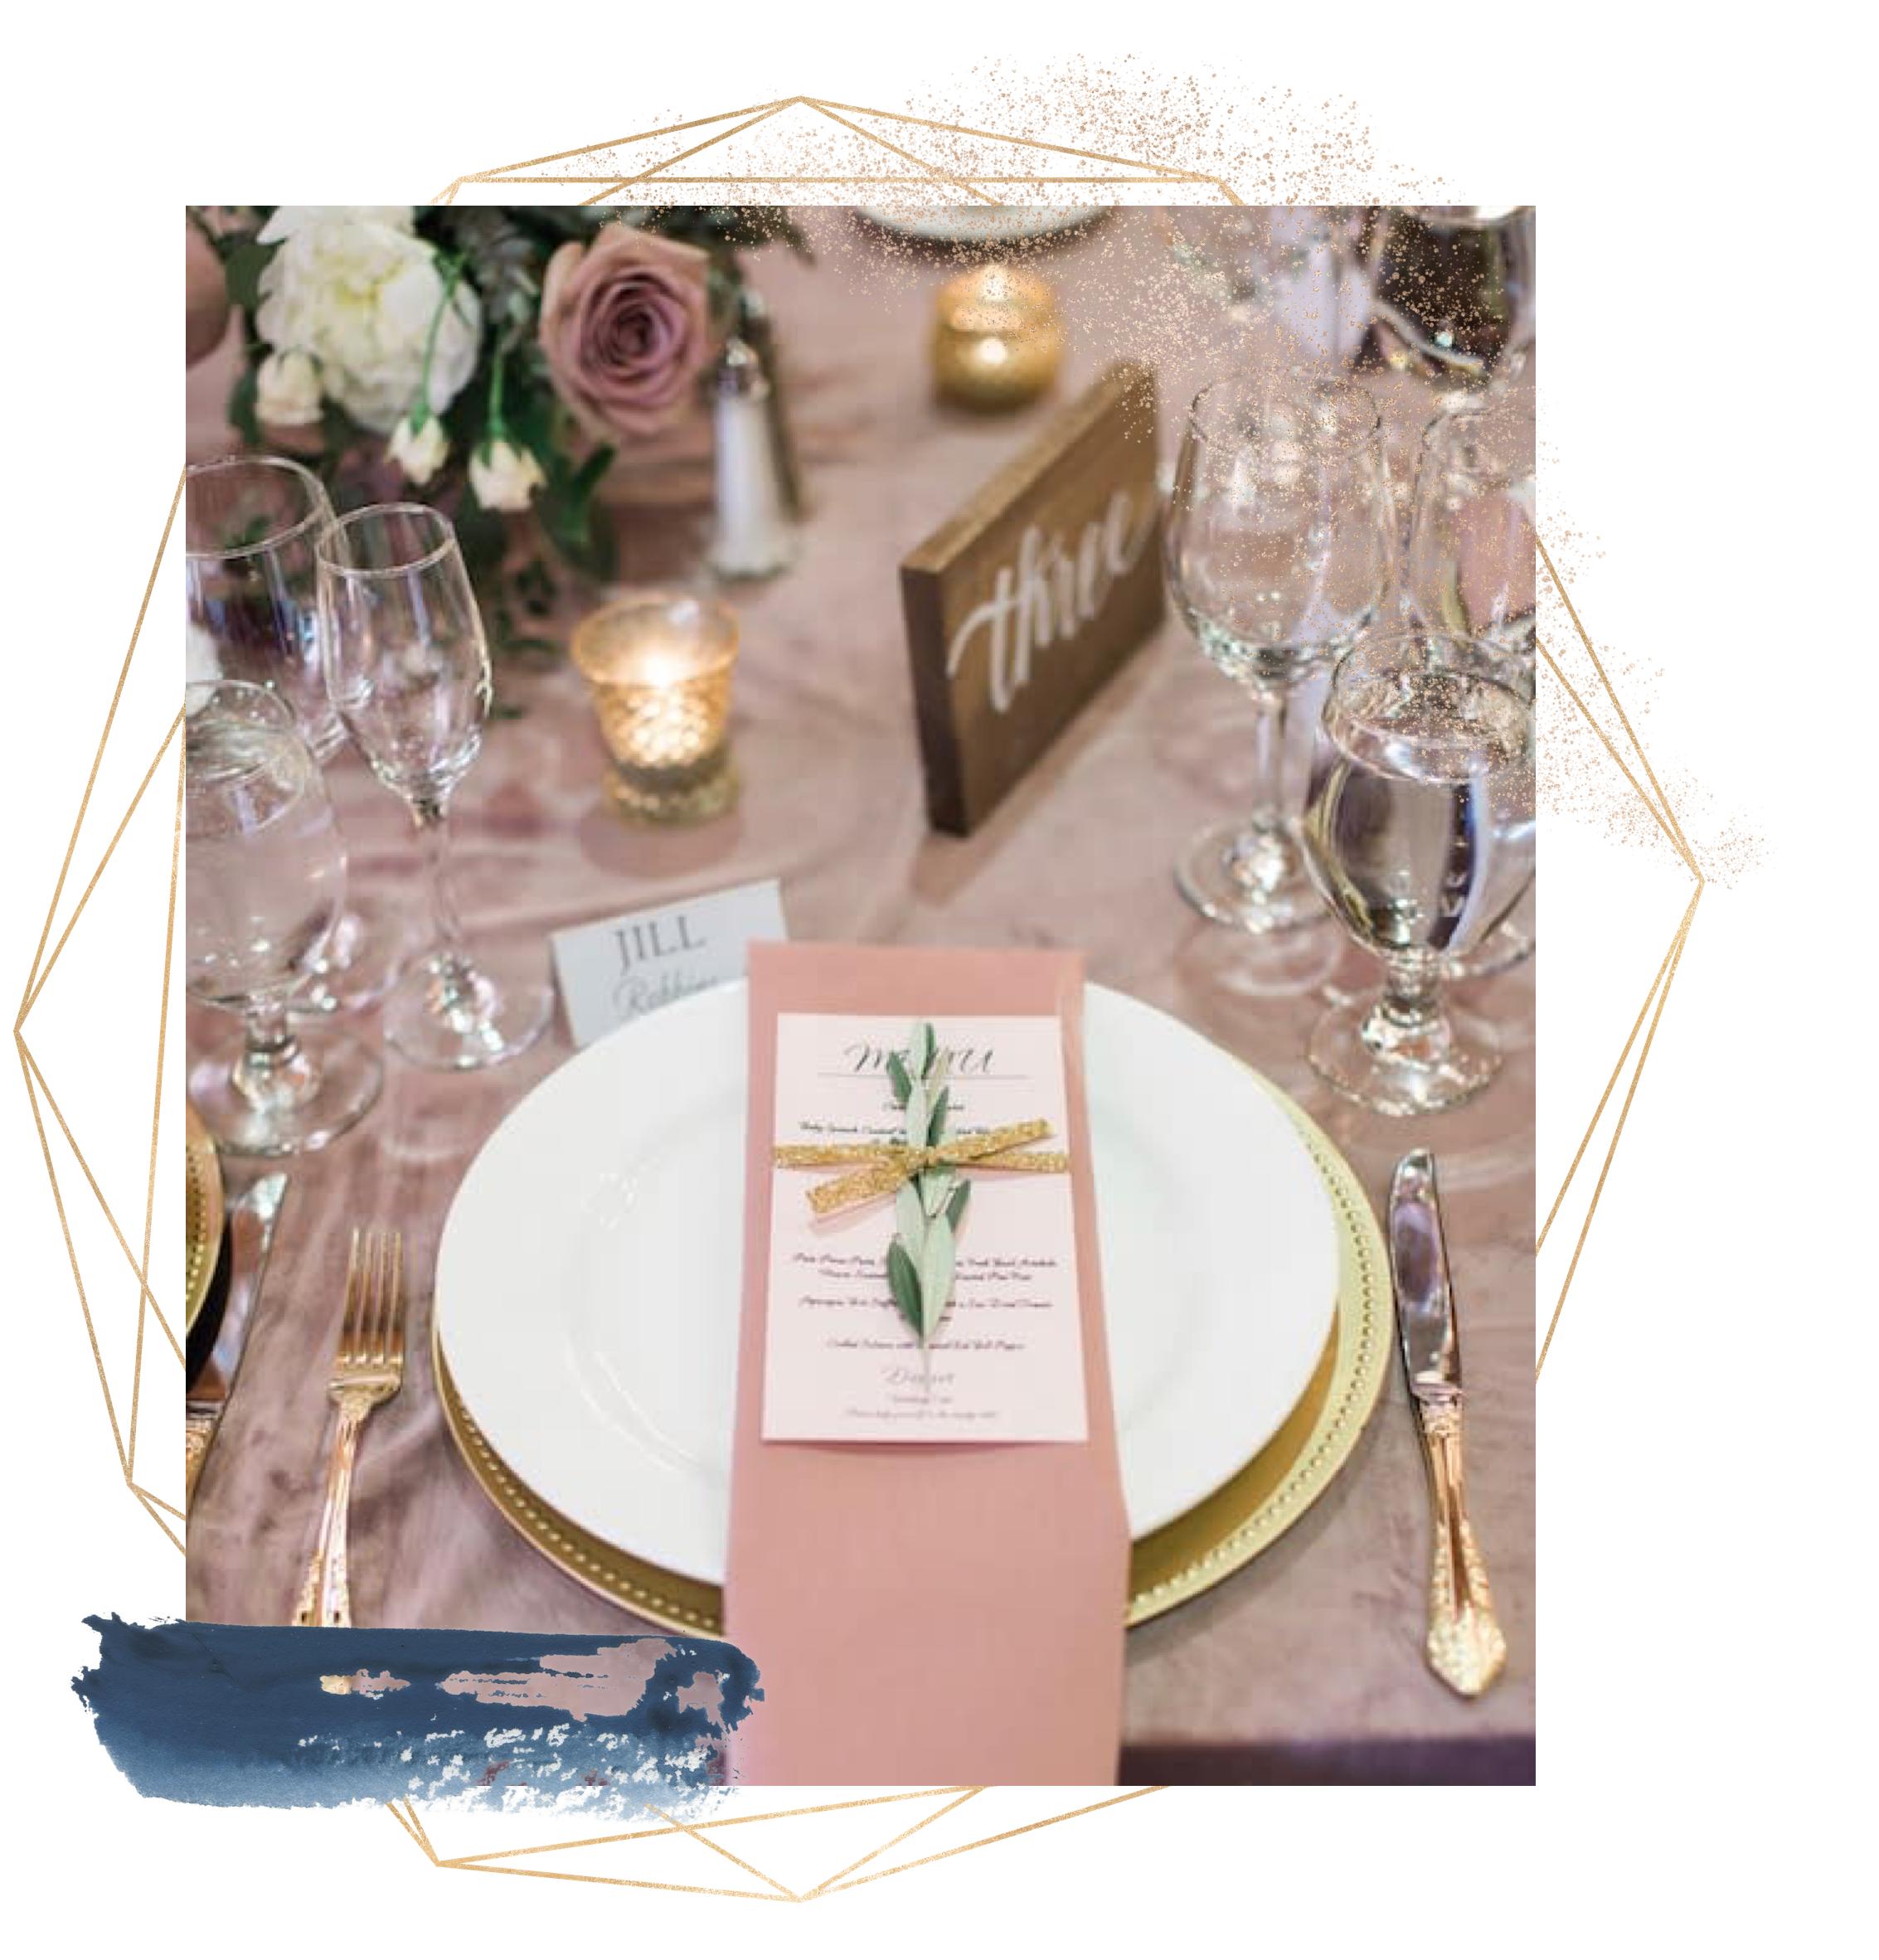 SacDecorNrentals-wedding-sacramento-event-rentals-2.png